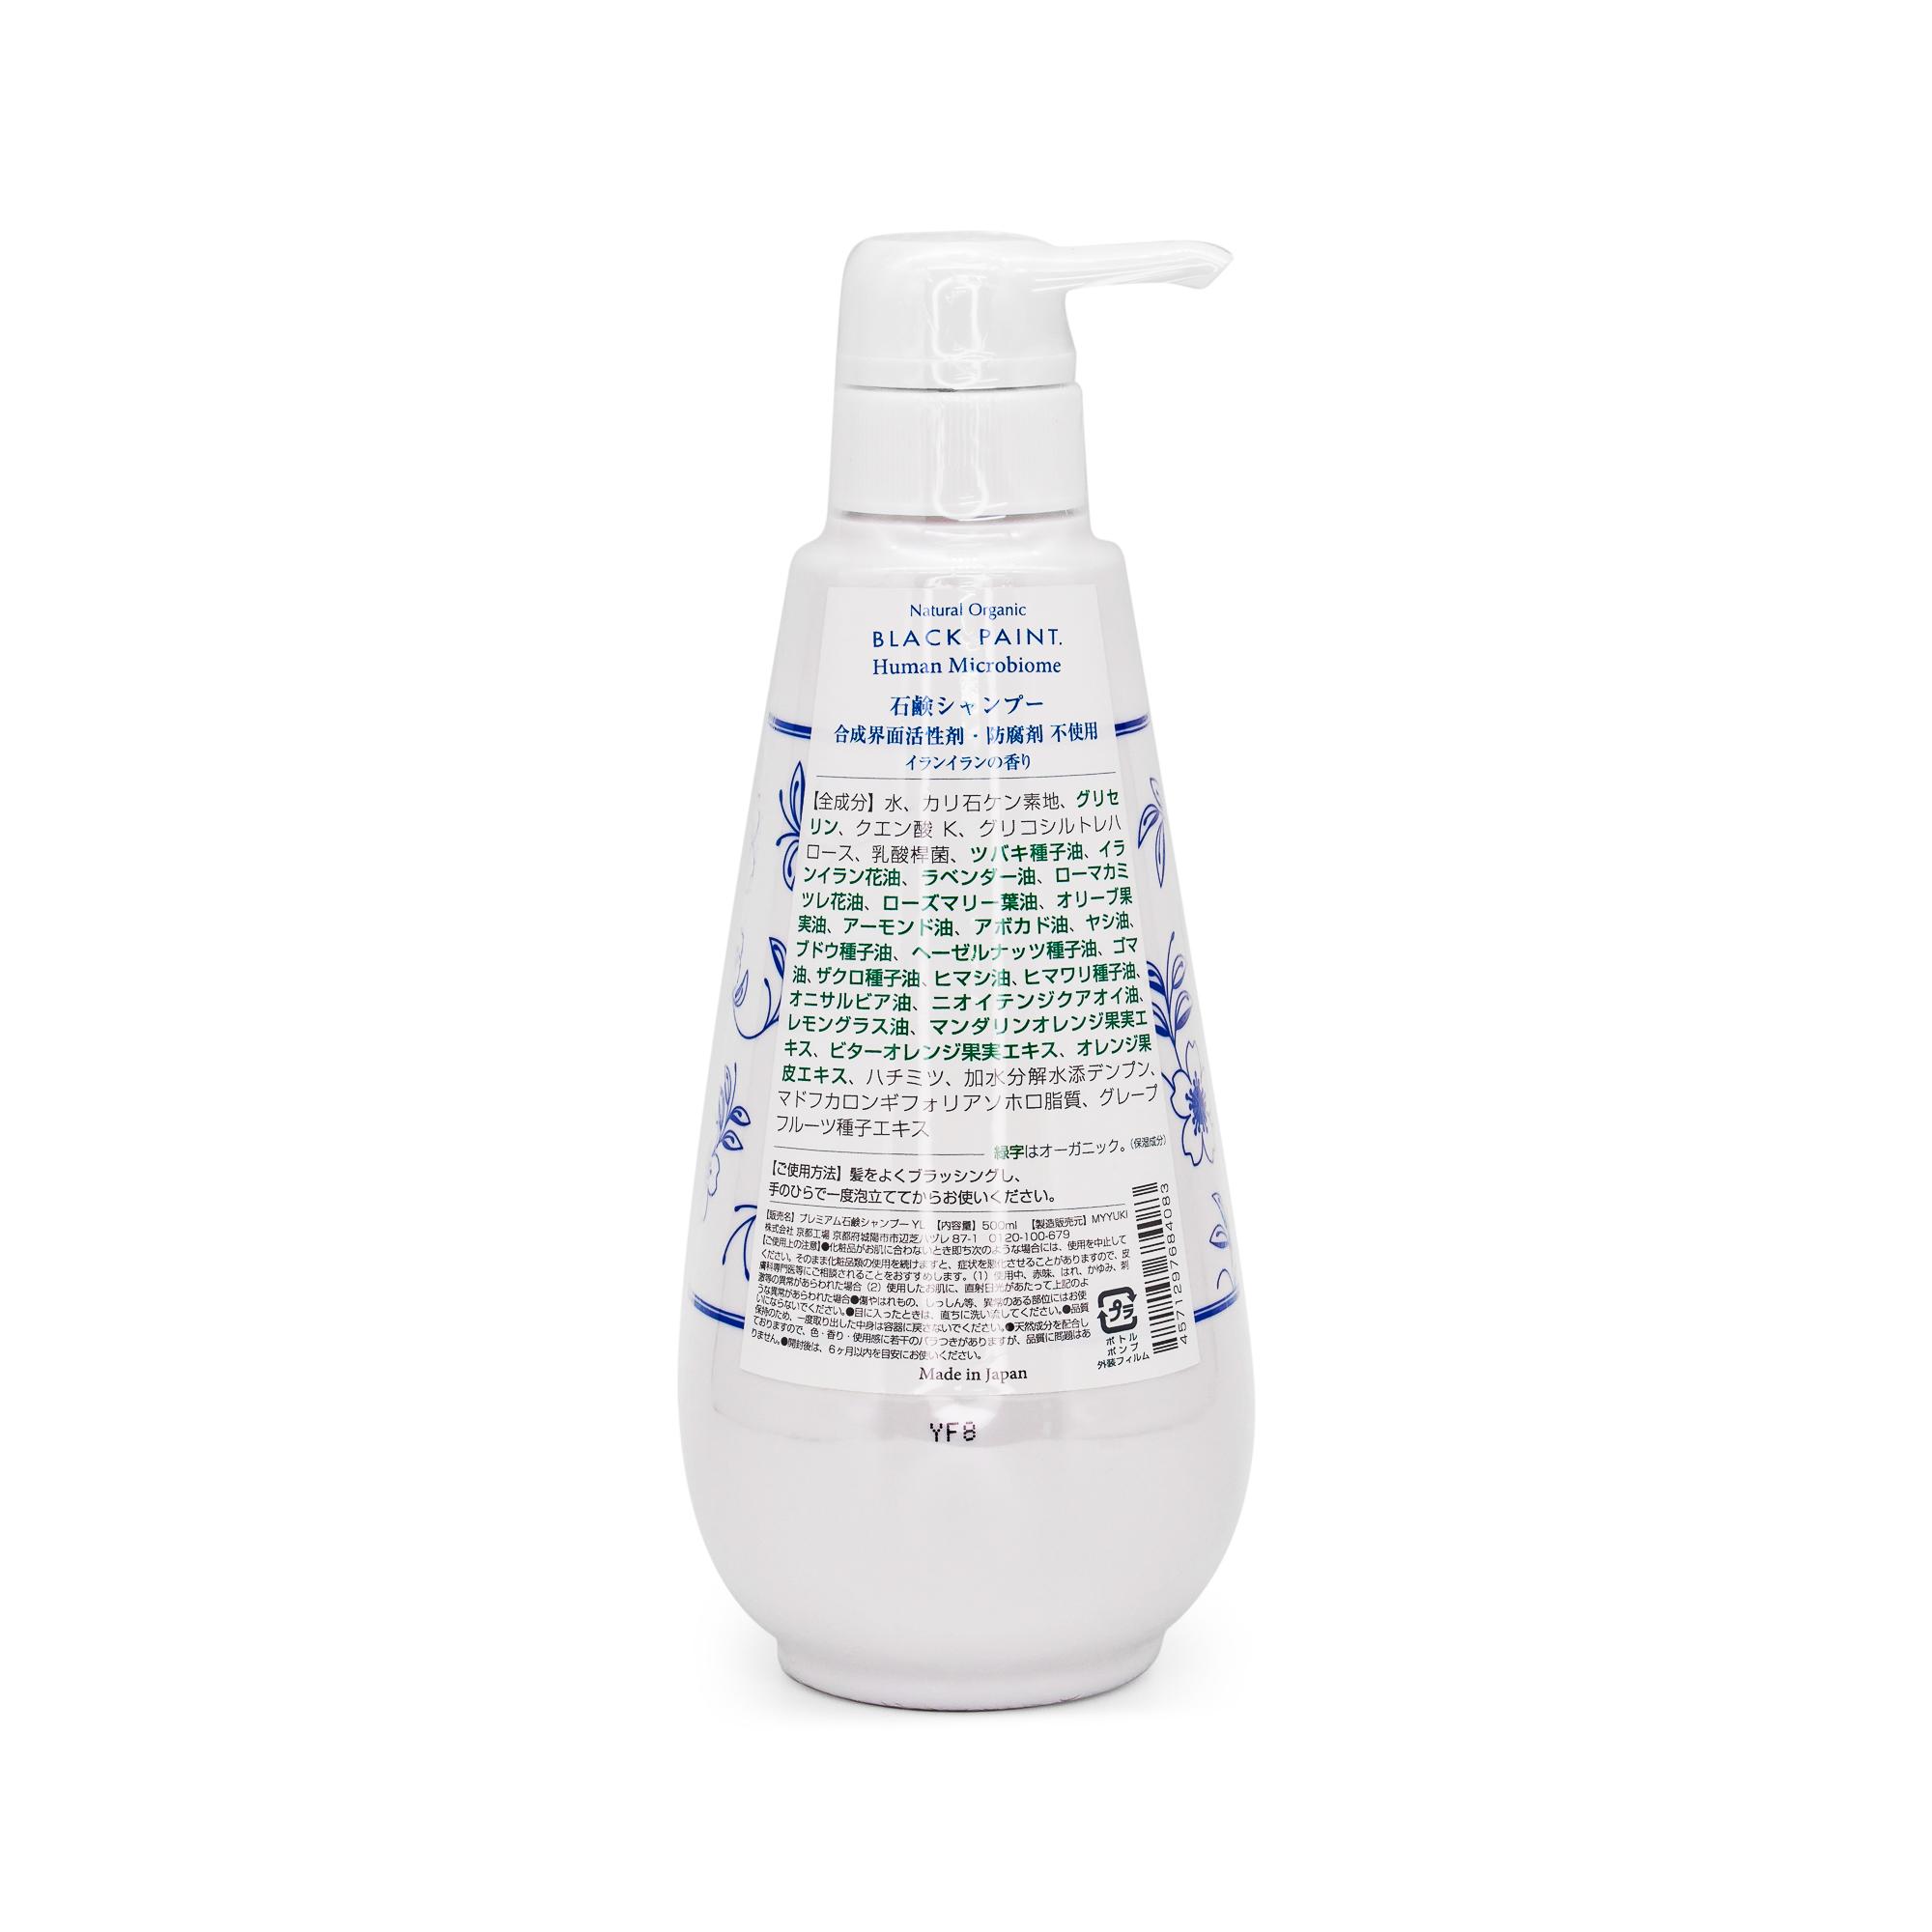 Shampoo 500ml with Human Microbiome - back